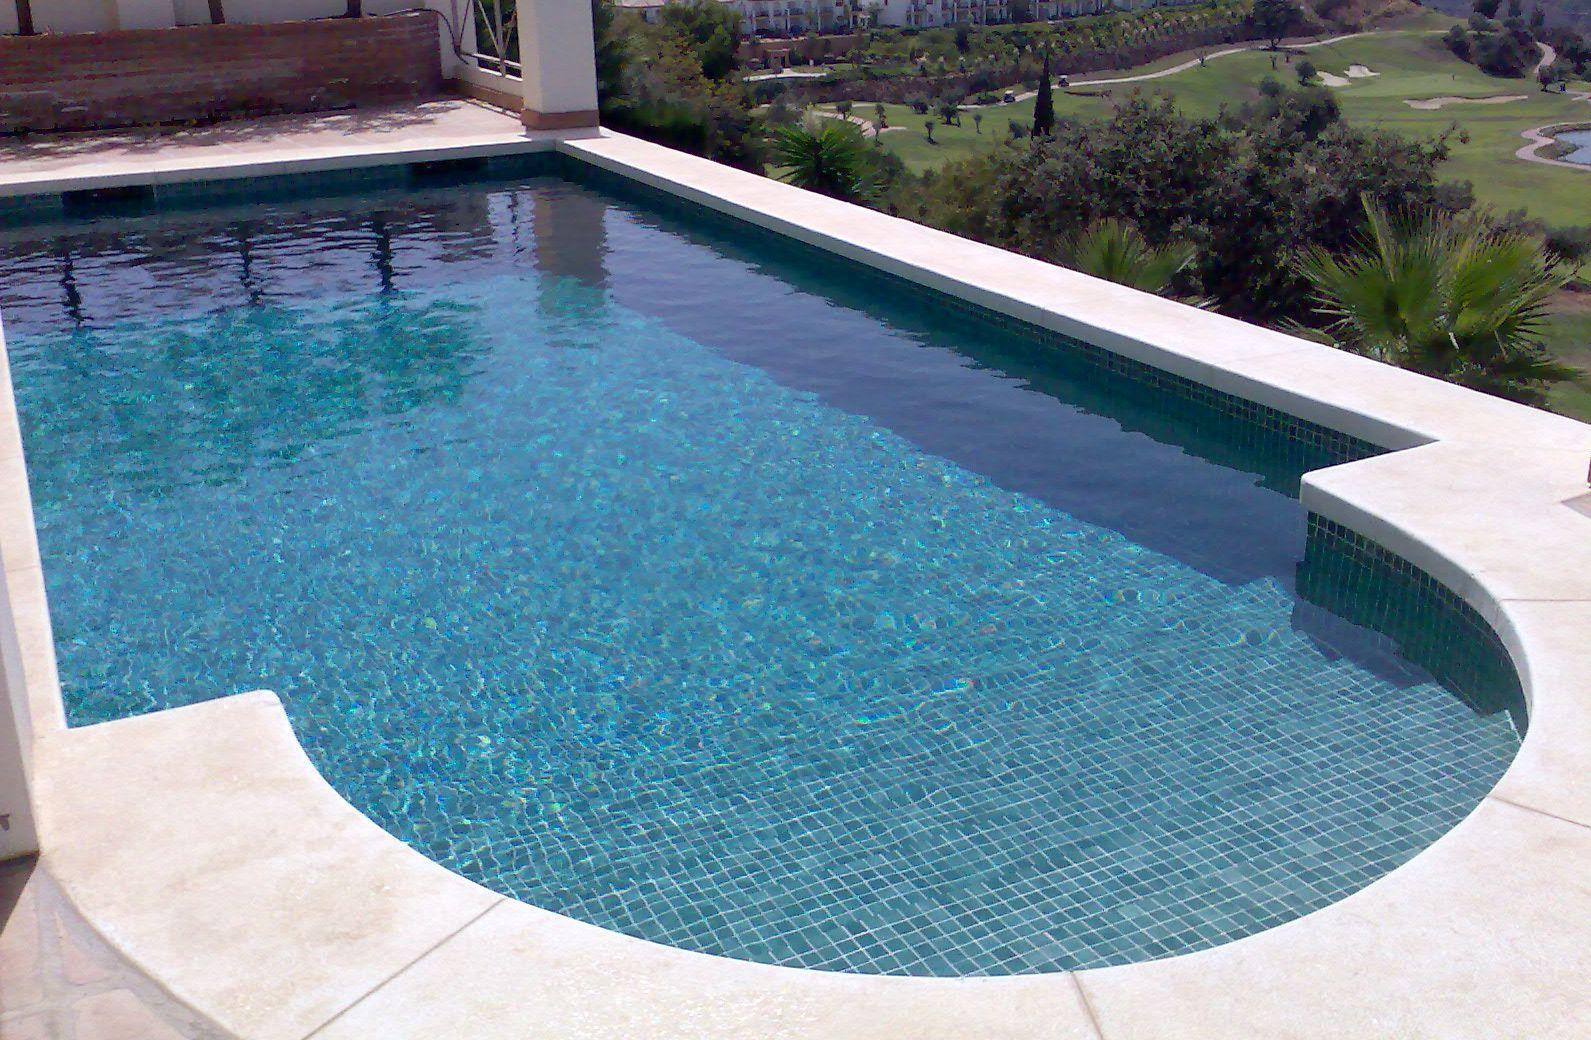 Pool filters salt water pool filters for Salt water swimming pool